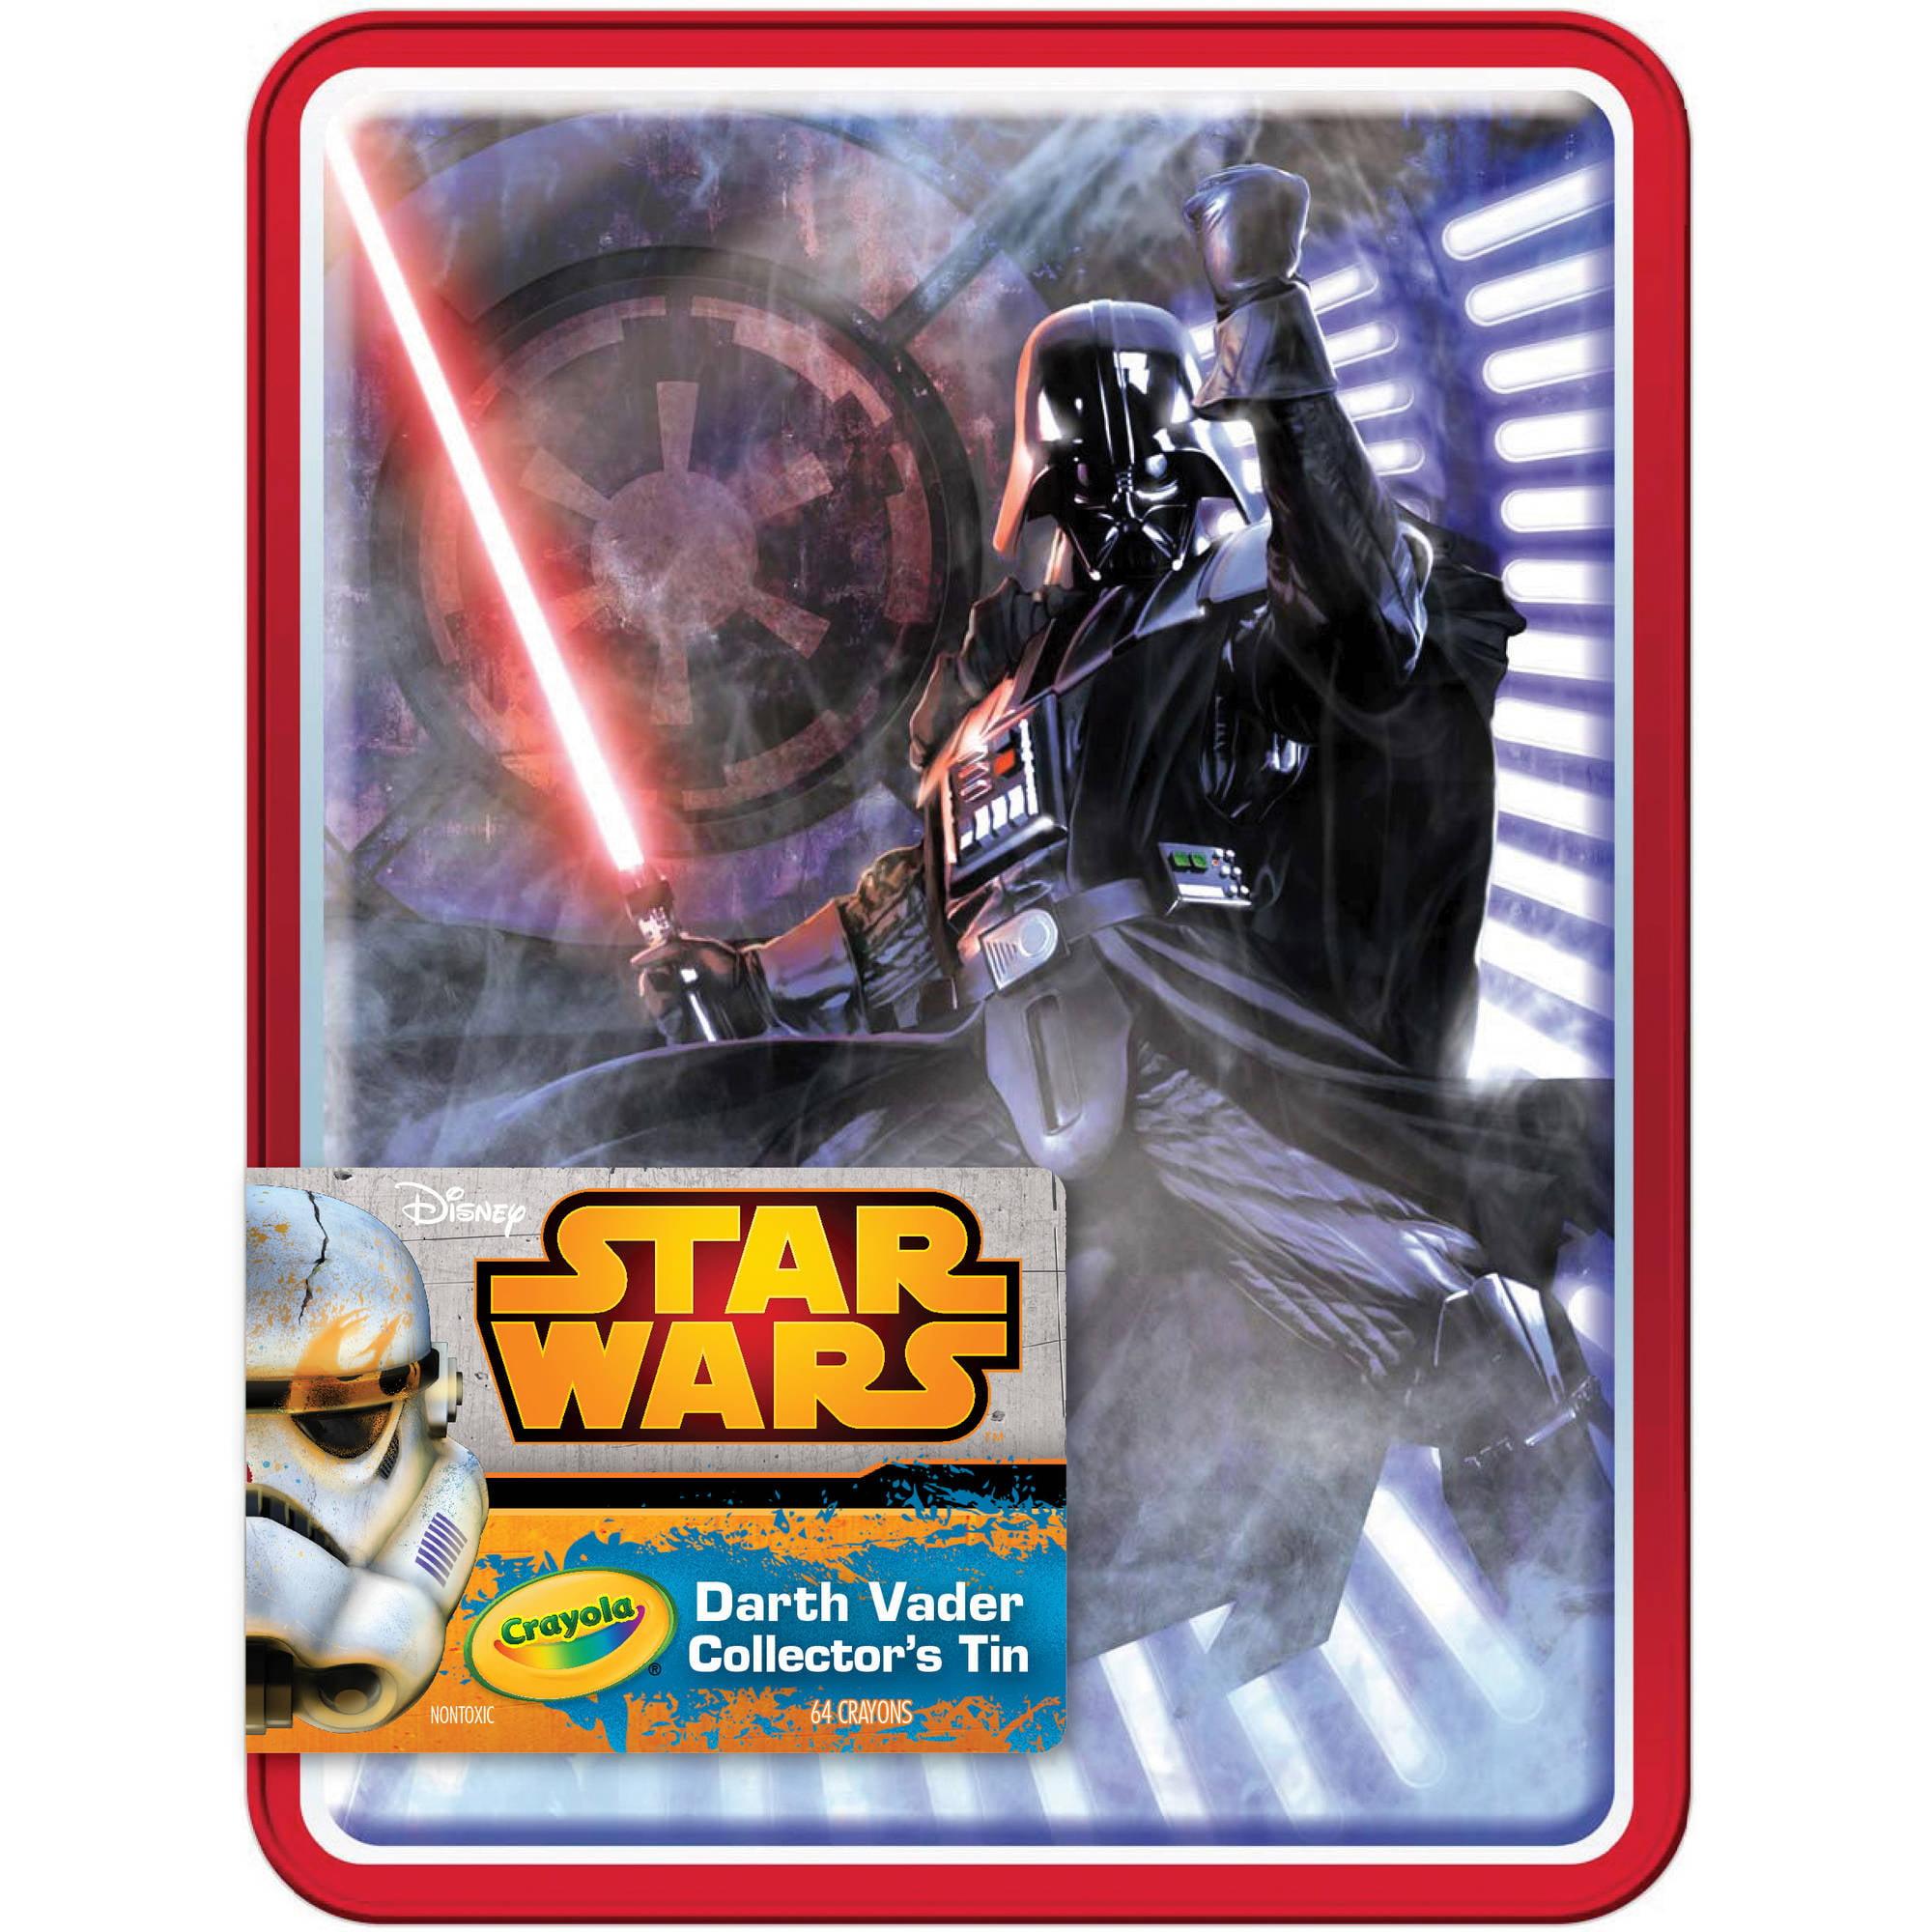 Star Wars Limited Edition Collectible Crayon Tin, Darth Vader with 64 Ct. Crayon